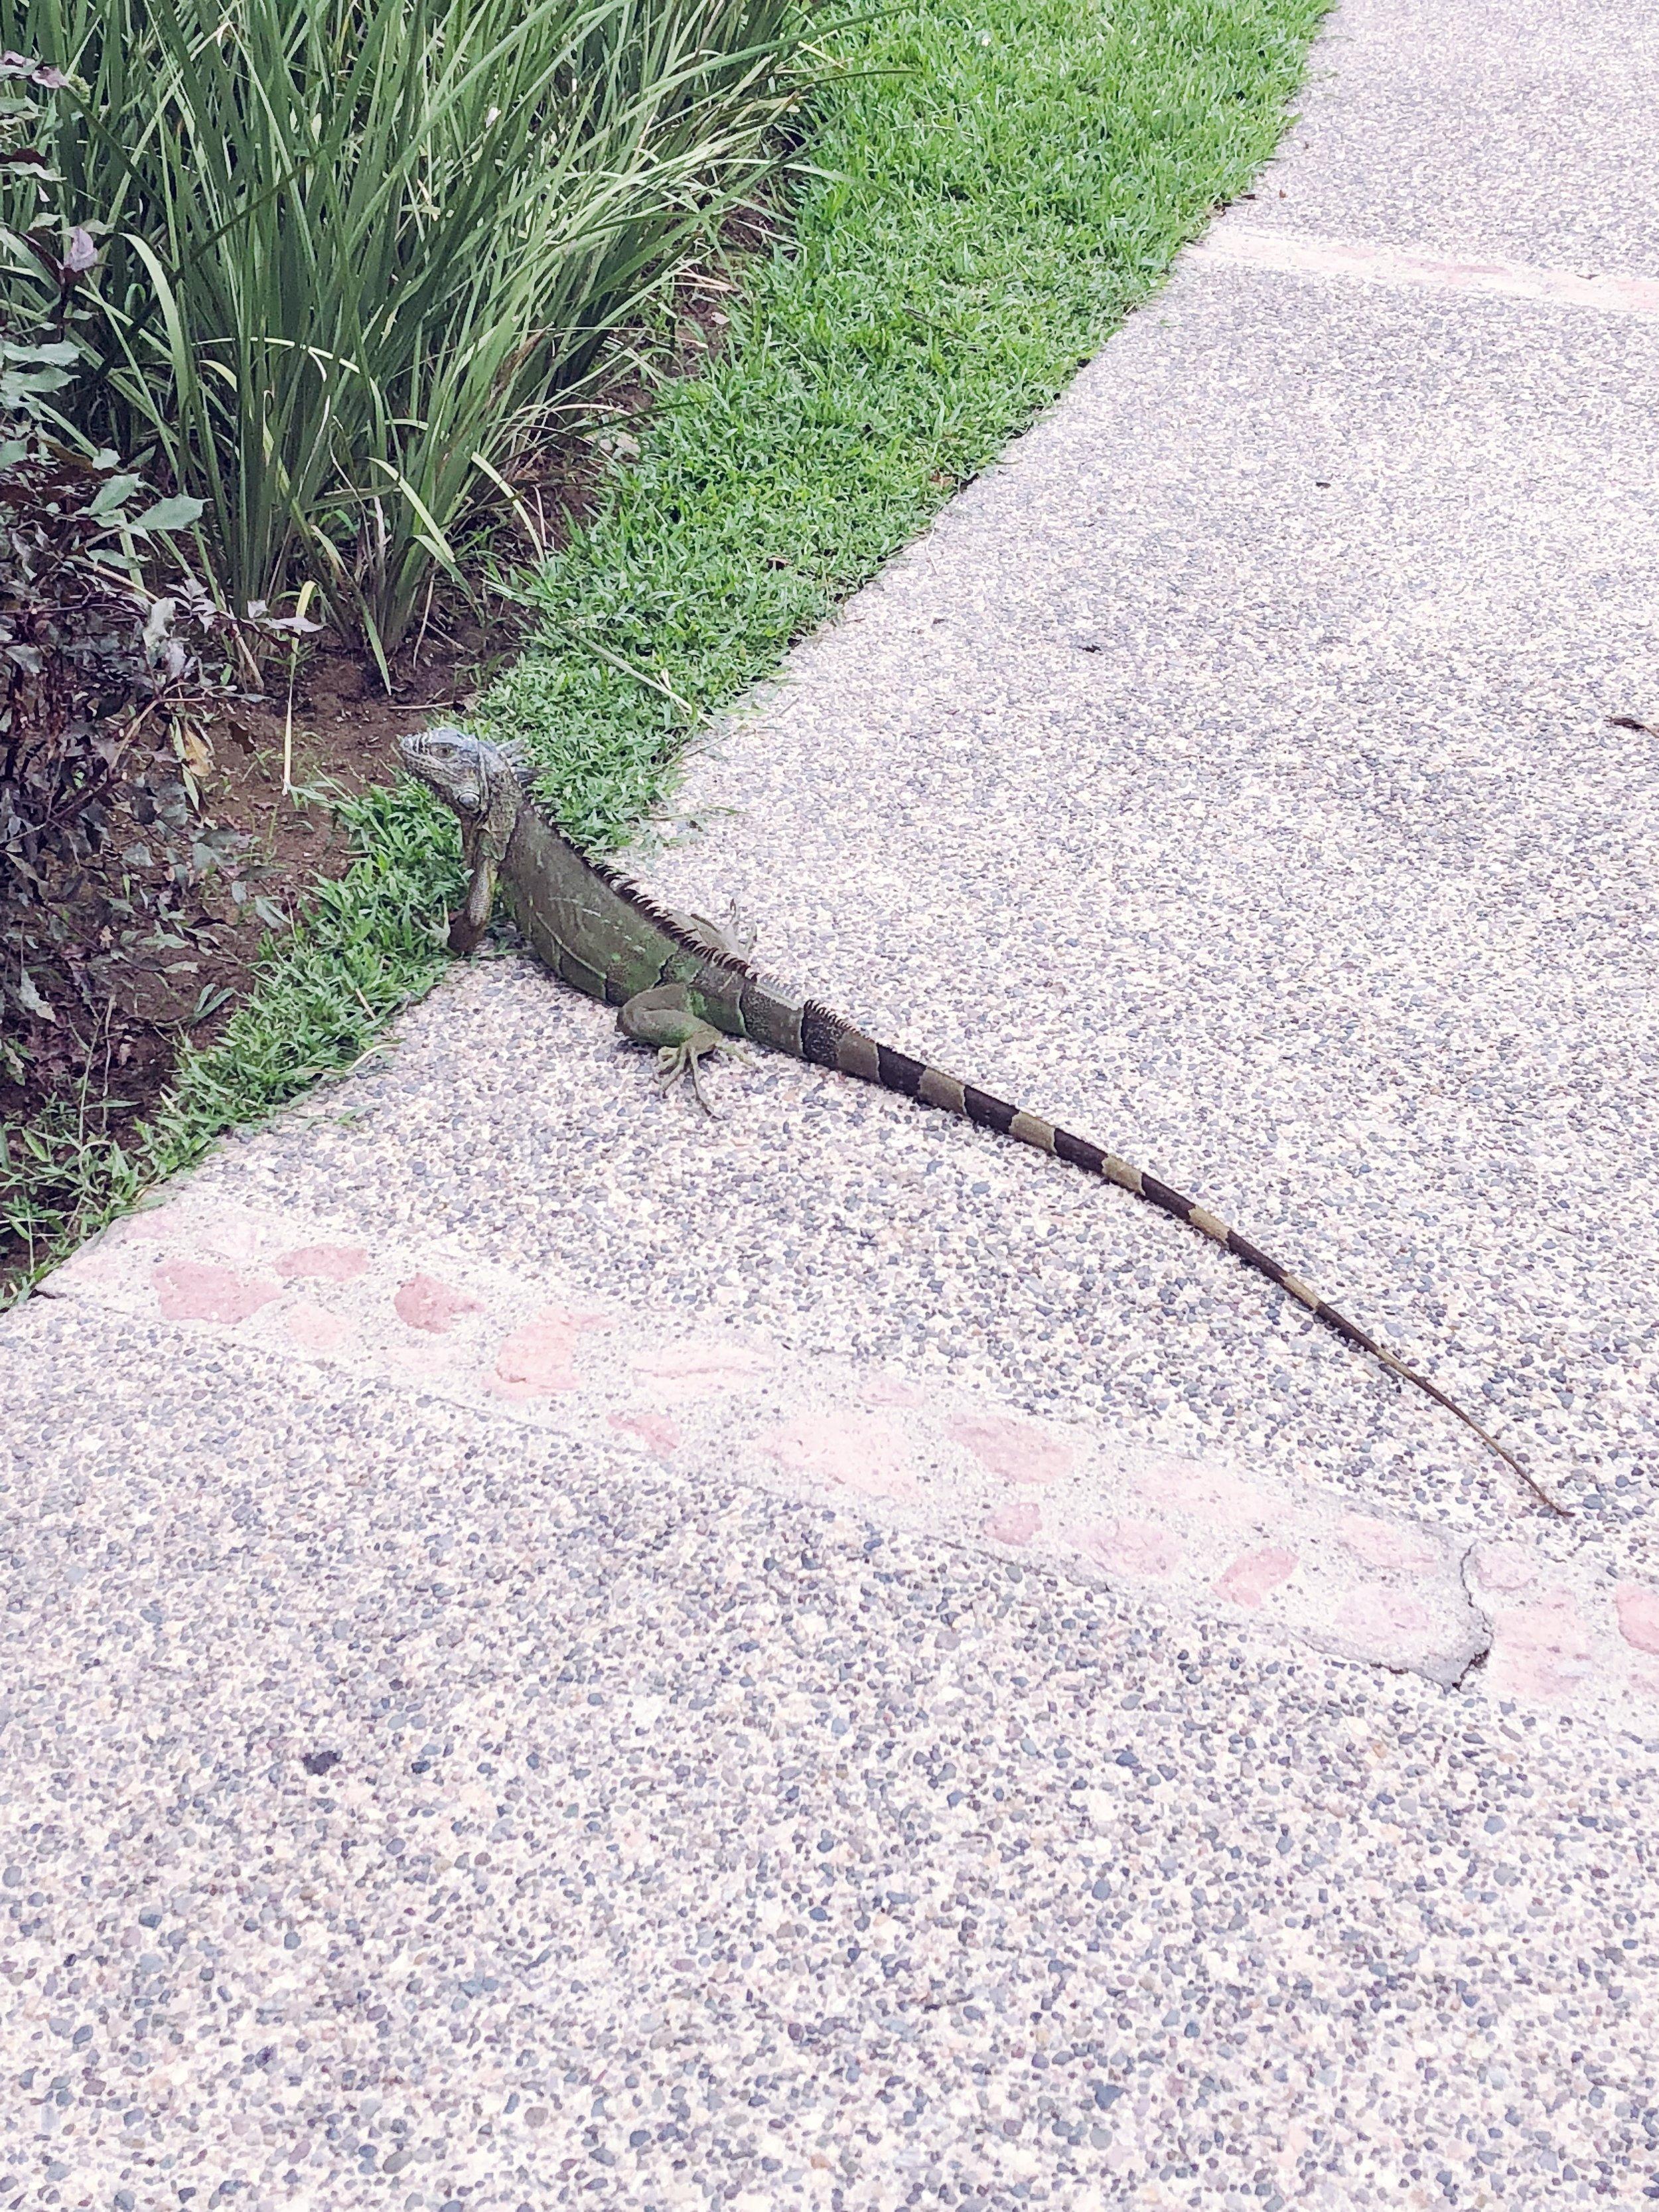 Iguanas are everywhere in Puerto Vallarta.